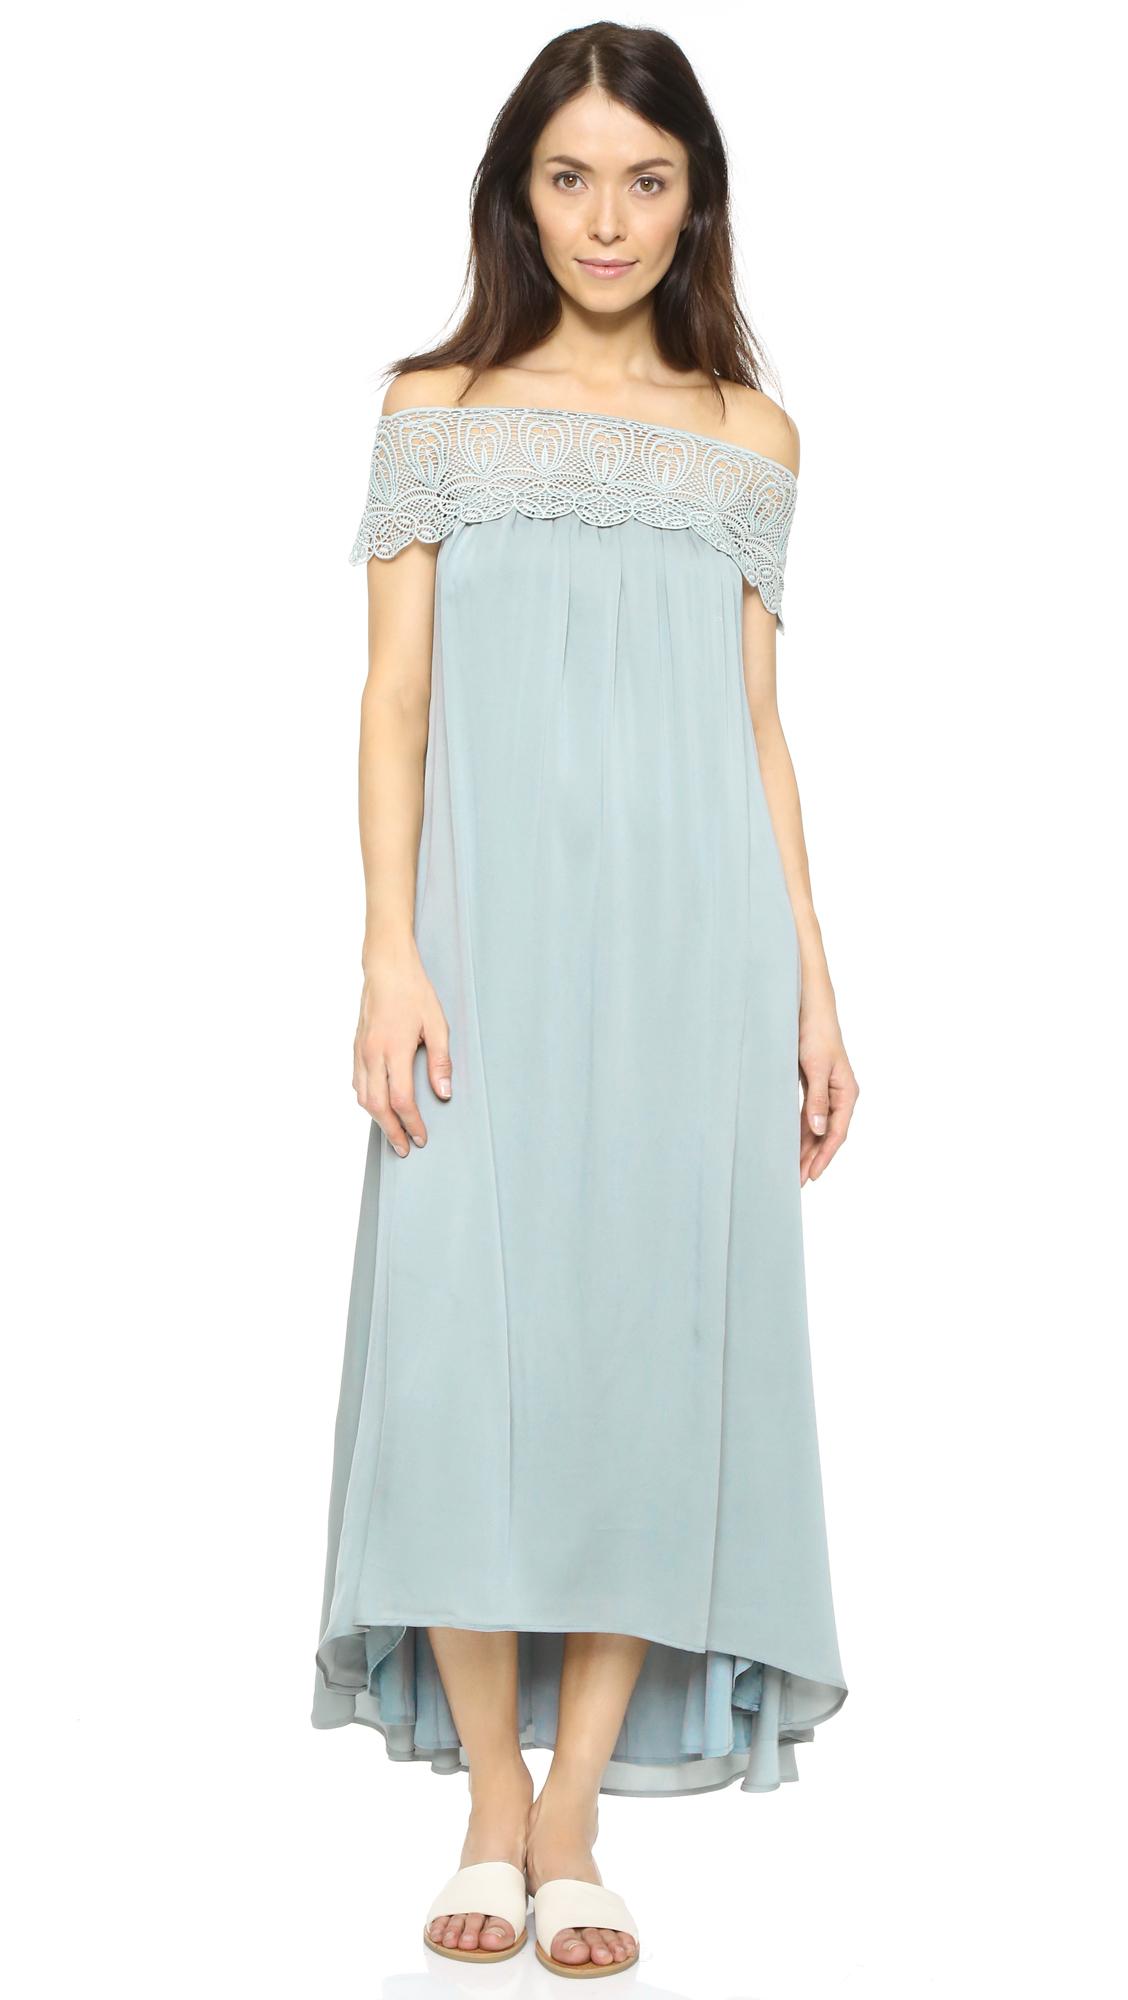 51663134bf5b Self-Portrait Off-The-Shoulder Maxi Dress in Blue - Lyst